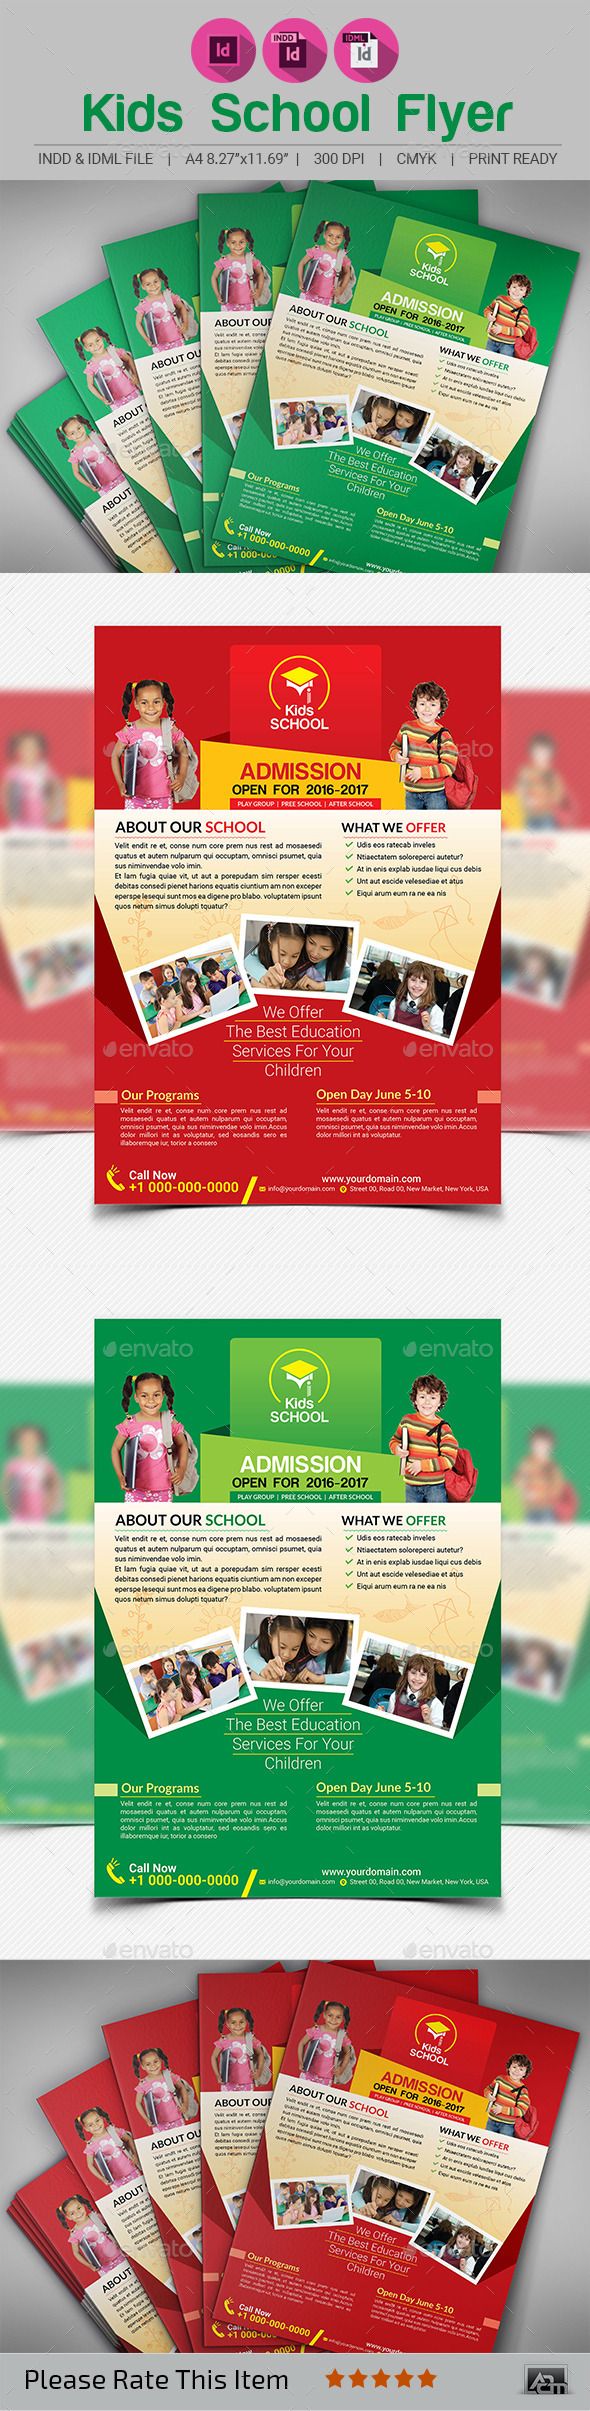 Kids School Flyer Template - Corporate Flyers